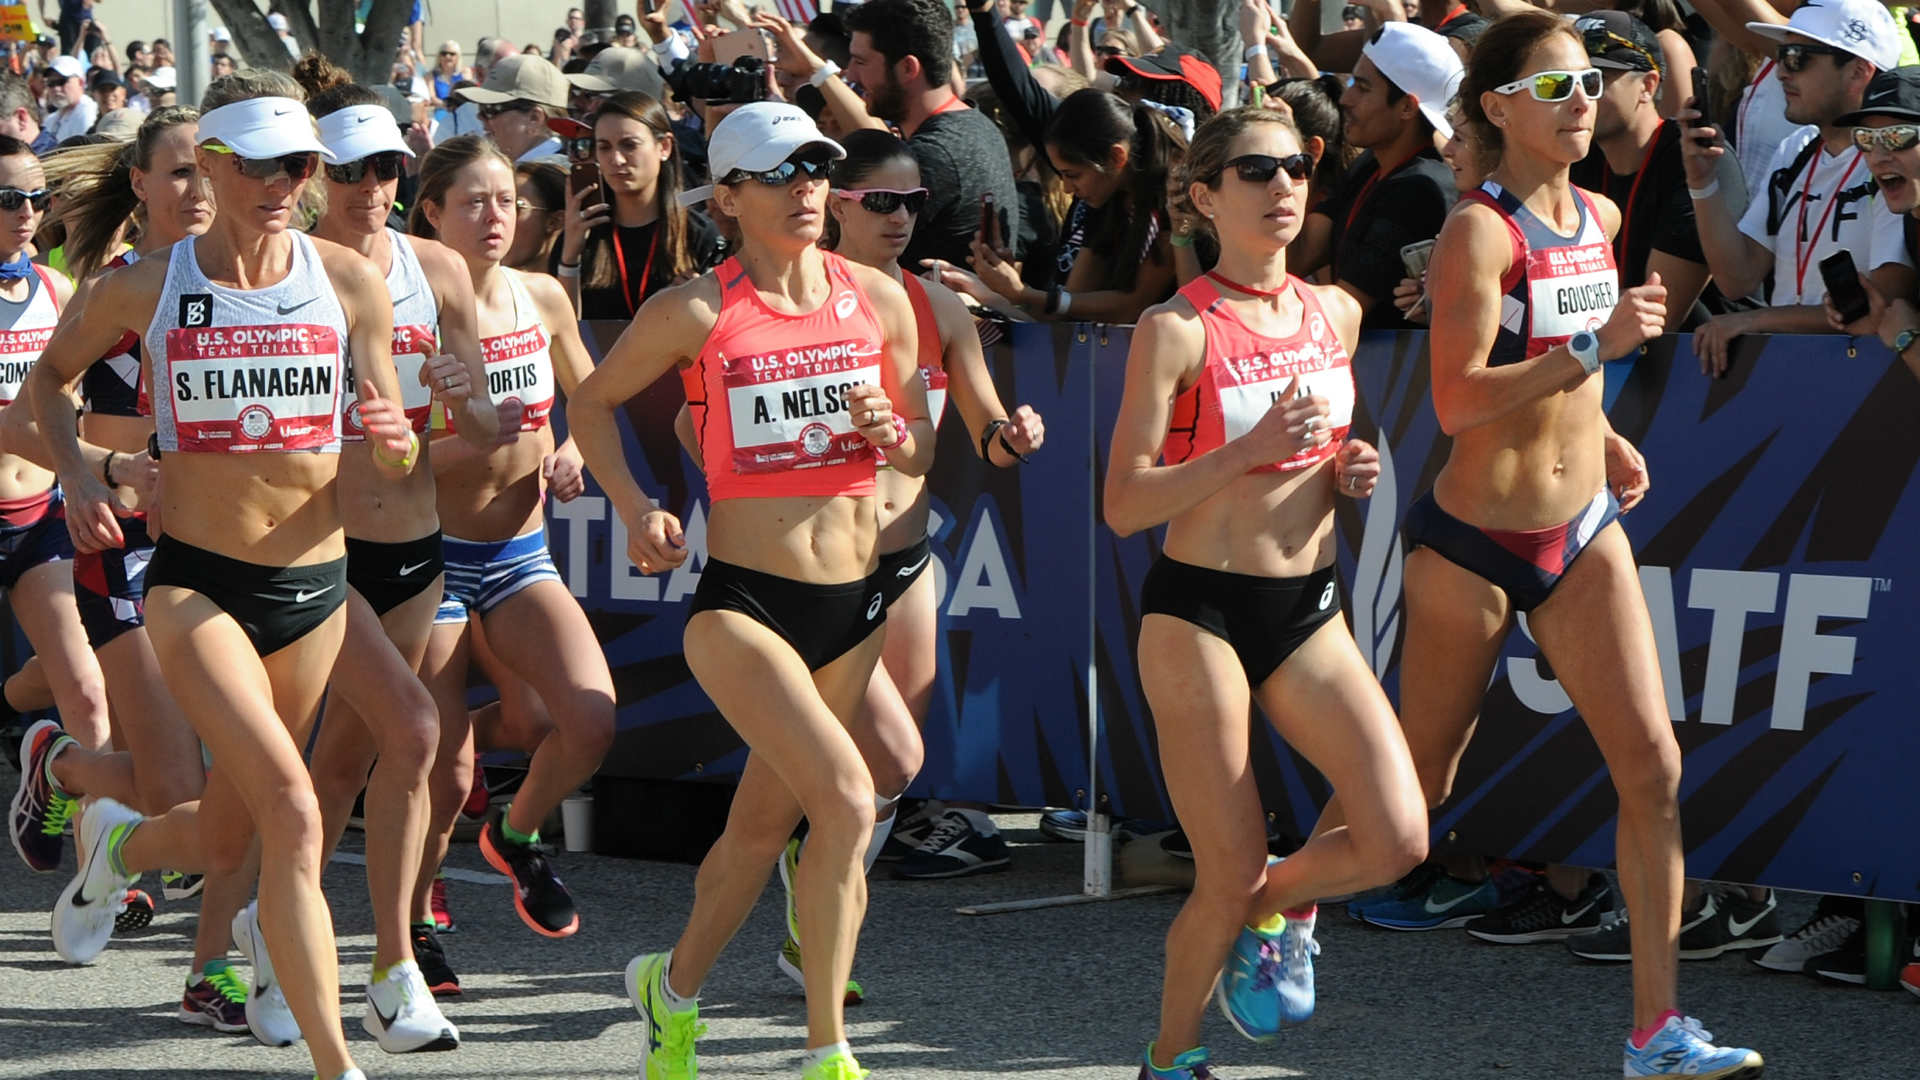 olympic-trials-2132016-us-news-getty-ftr